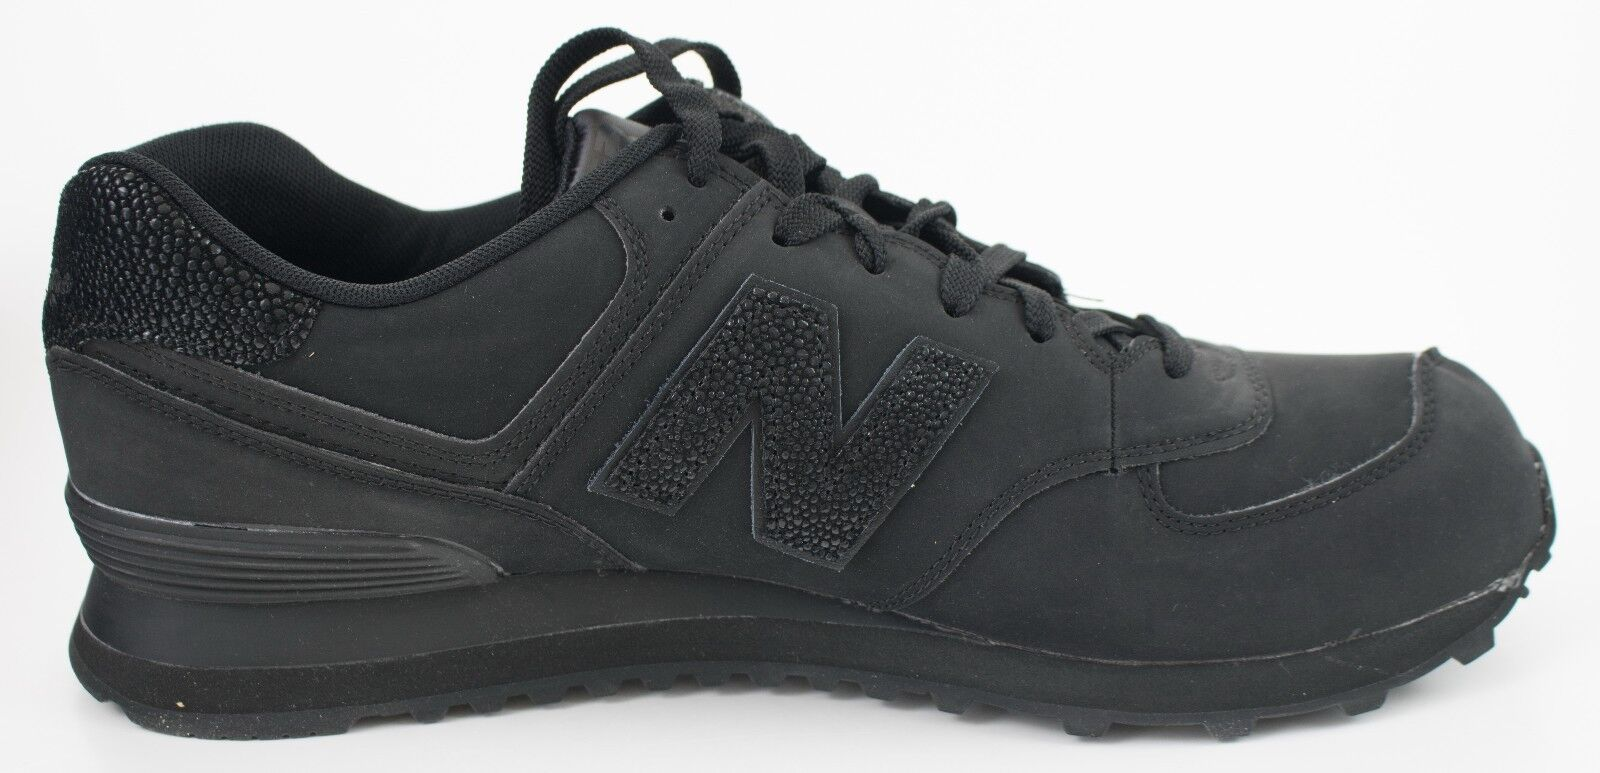 NEW BALANCE MENS ML574BEX CLASSICS Sneakers Sz 8 1/2 #GB5